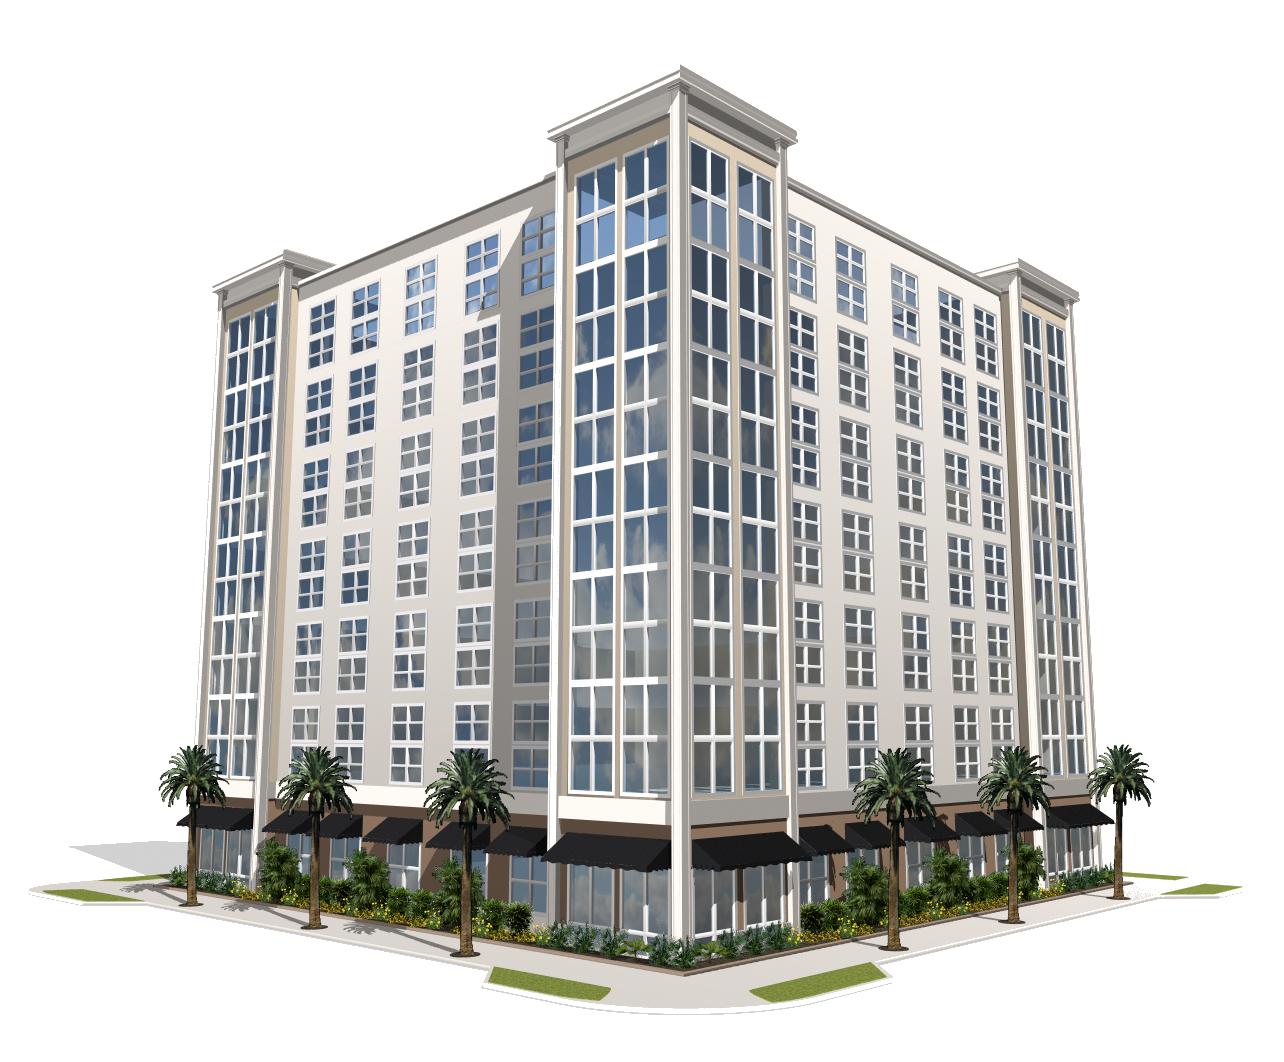 Png mart. Apartment clipart single building